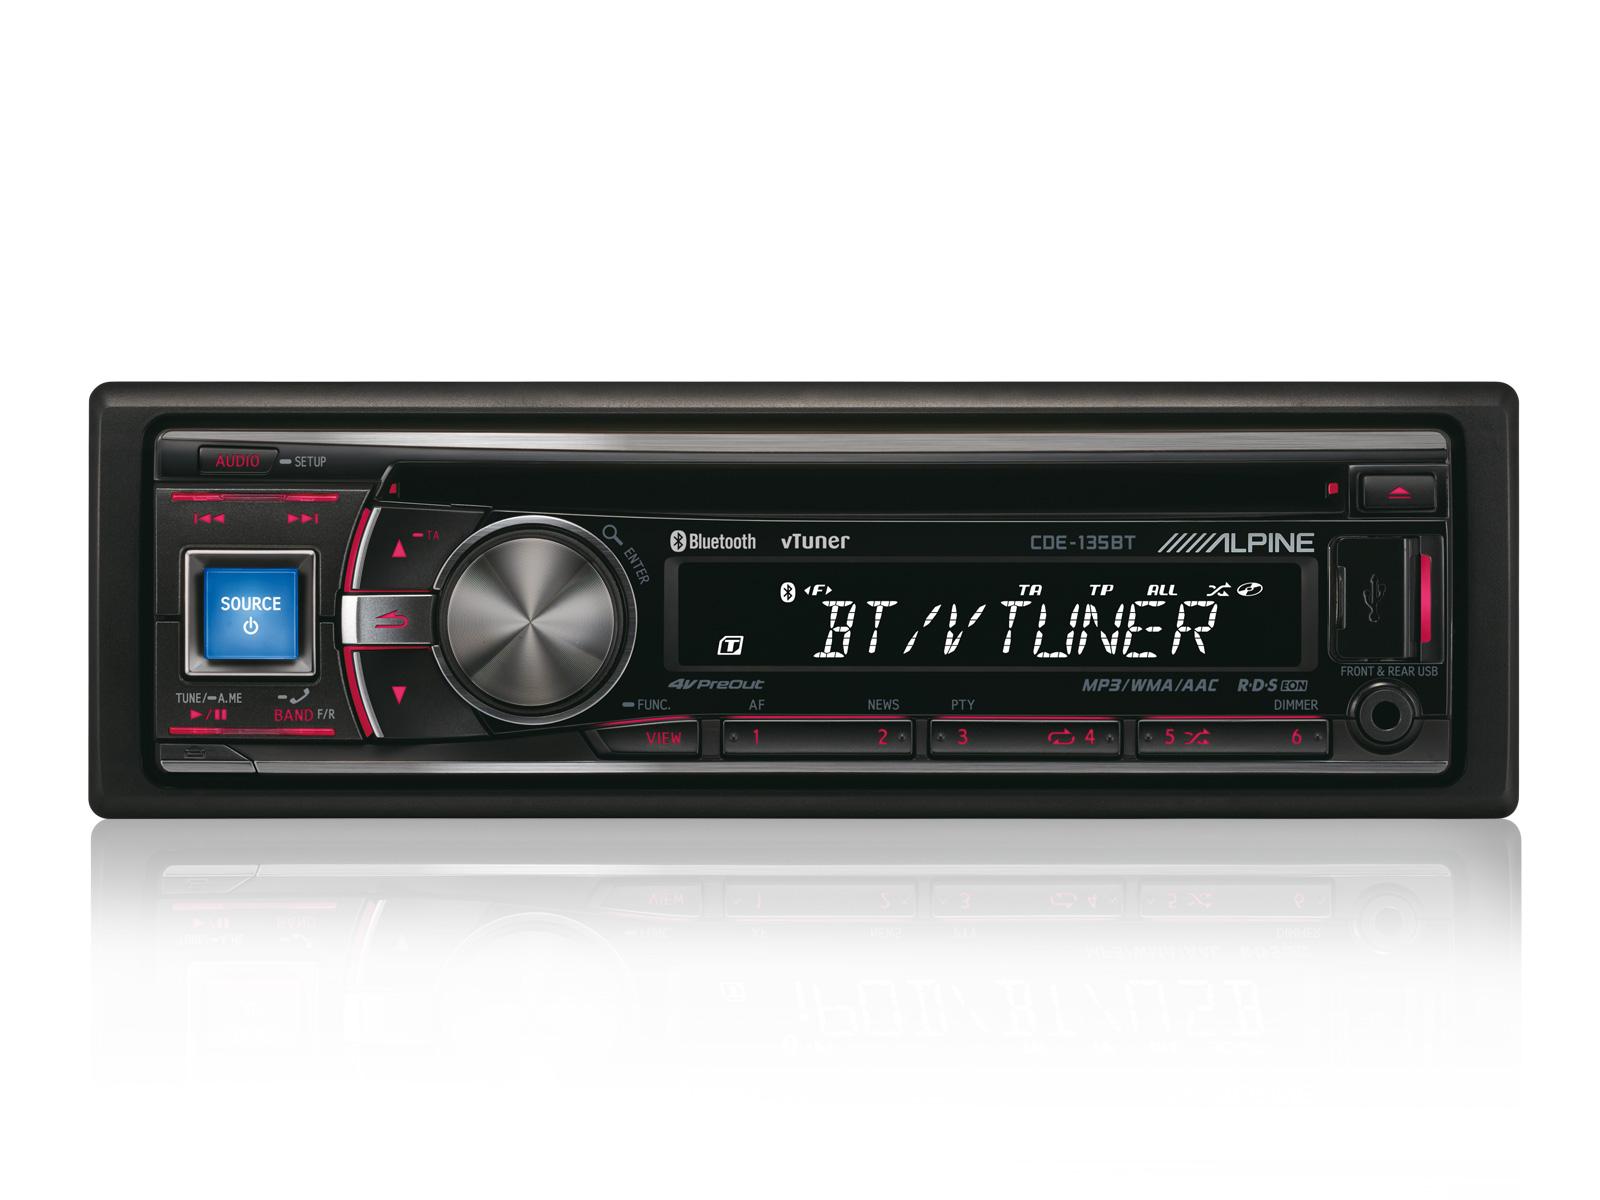 productpic_CDE 135BT_02 internet radio receiver alpine cde 135bt alpine cde153bt wiring diagram at honlapkeszites.co